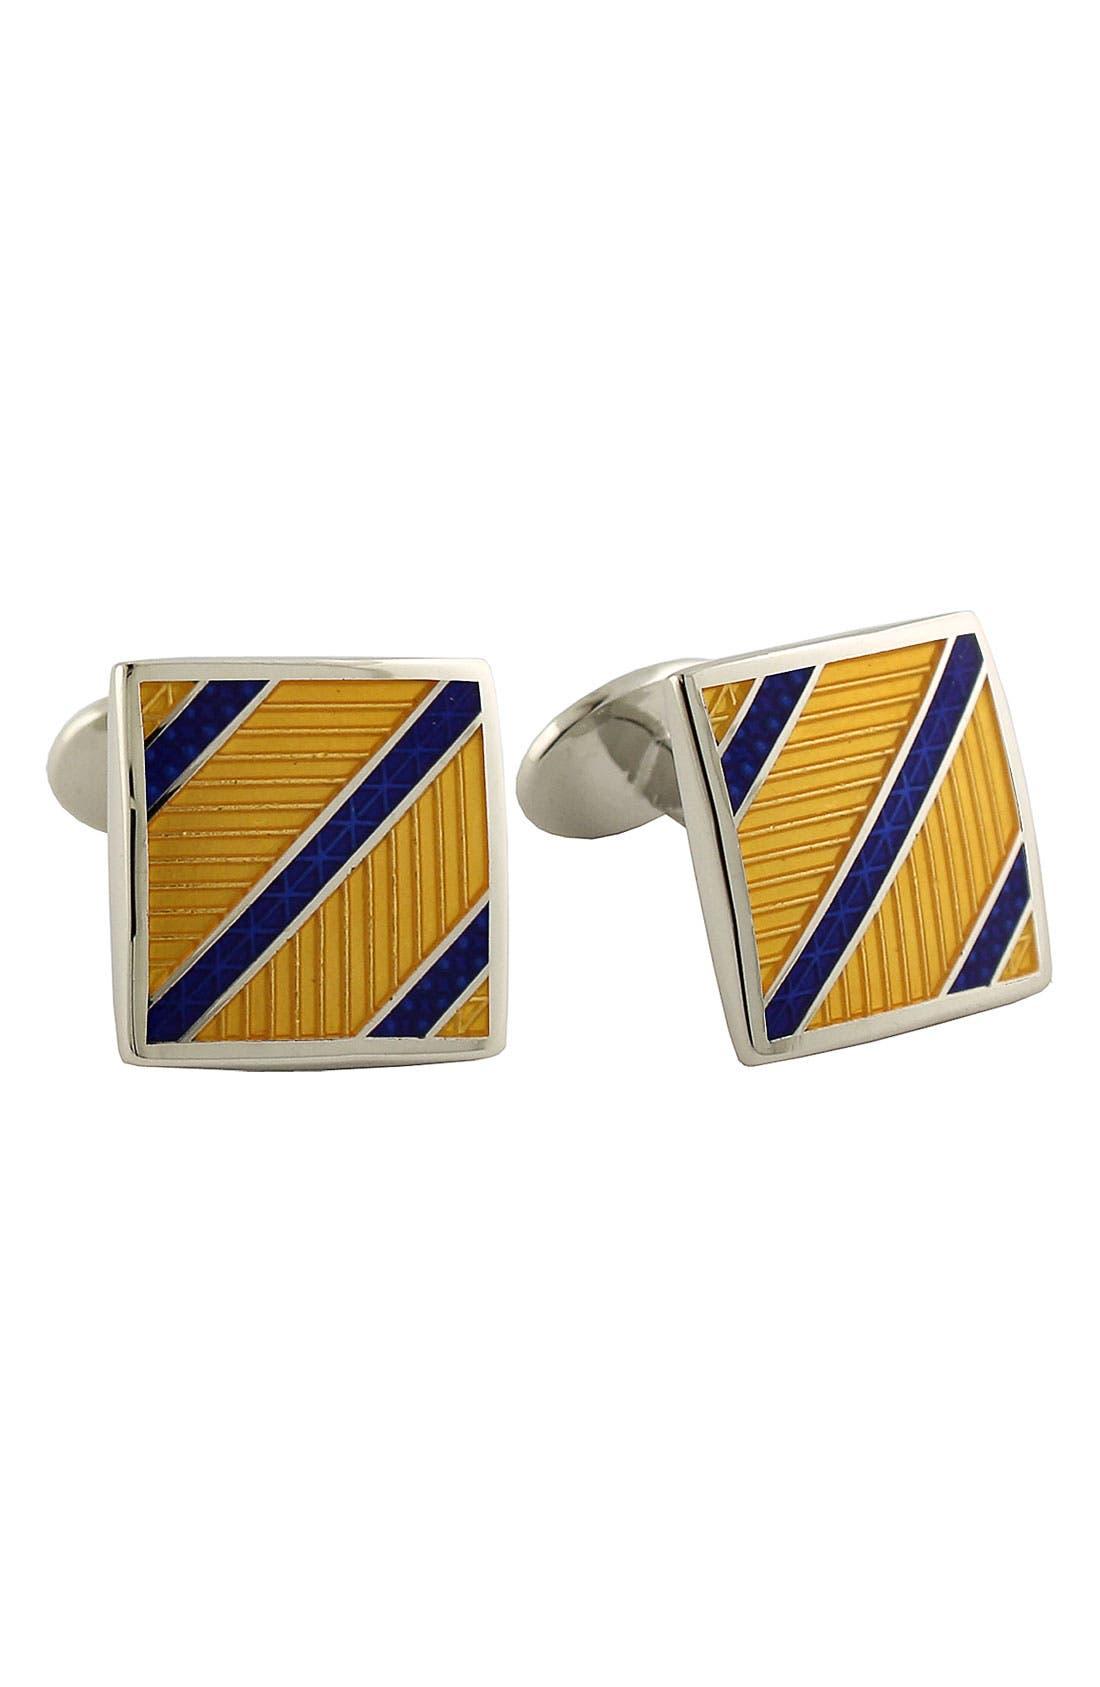 David Donahue 'Diagonal Stripe' Cuff Links